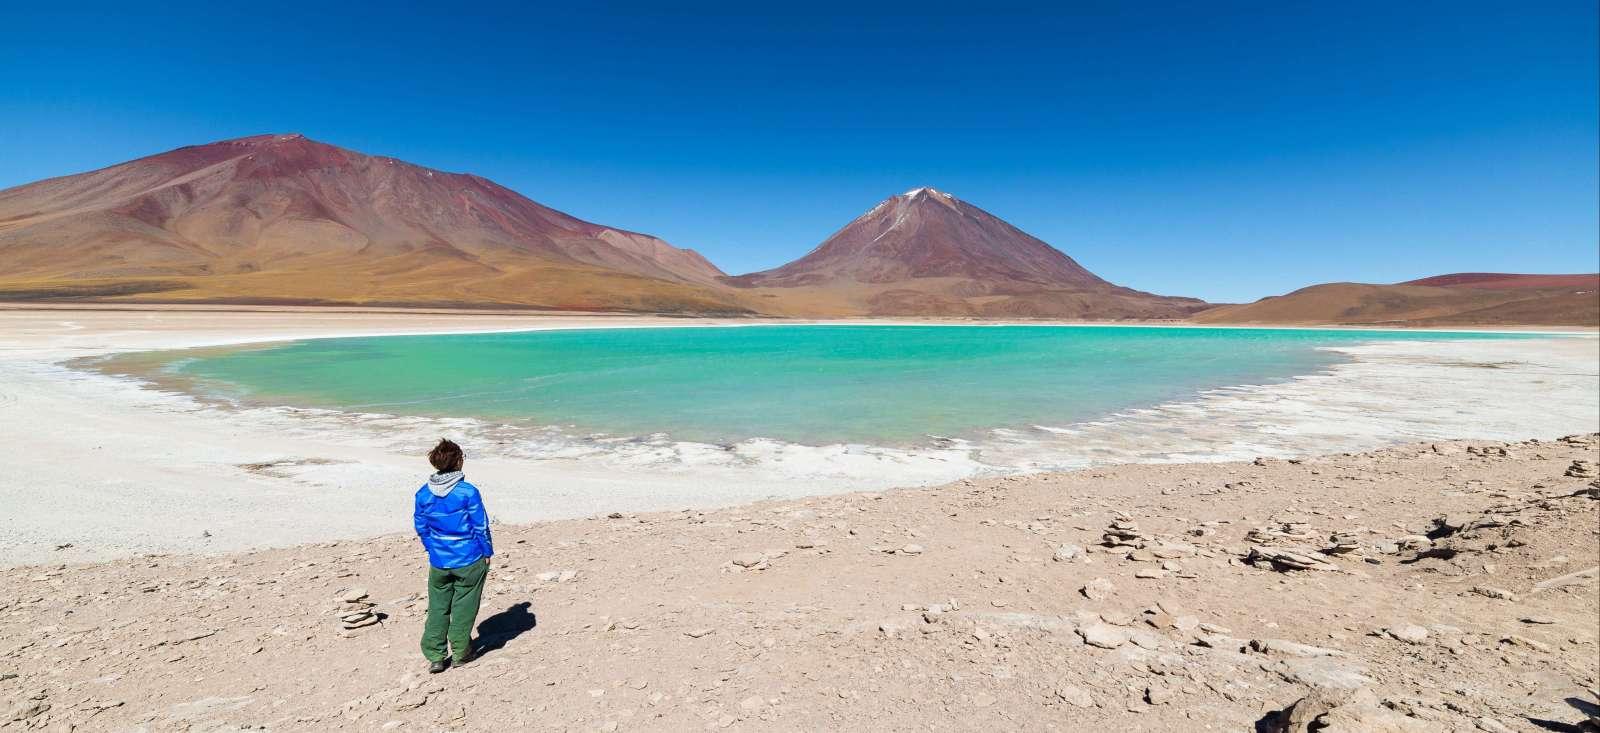 Voyage à pied : Désert d\'Atacama & Salar d\'Uyuni